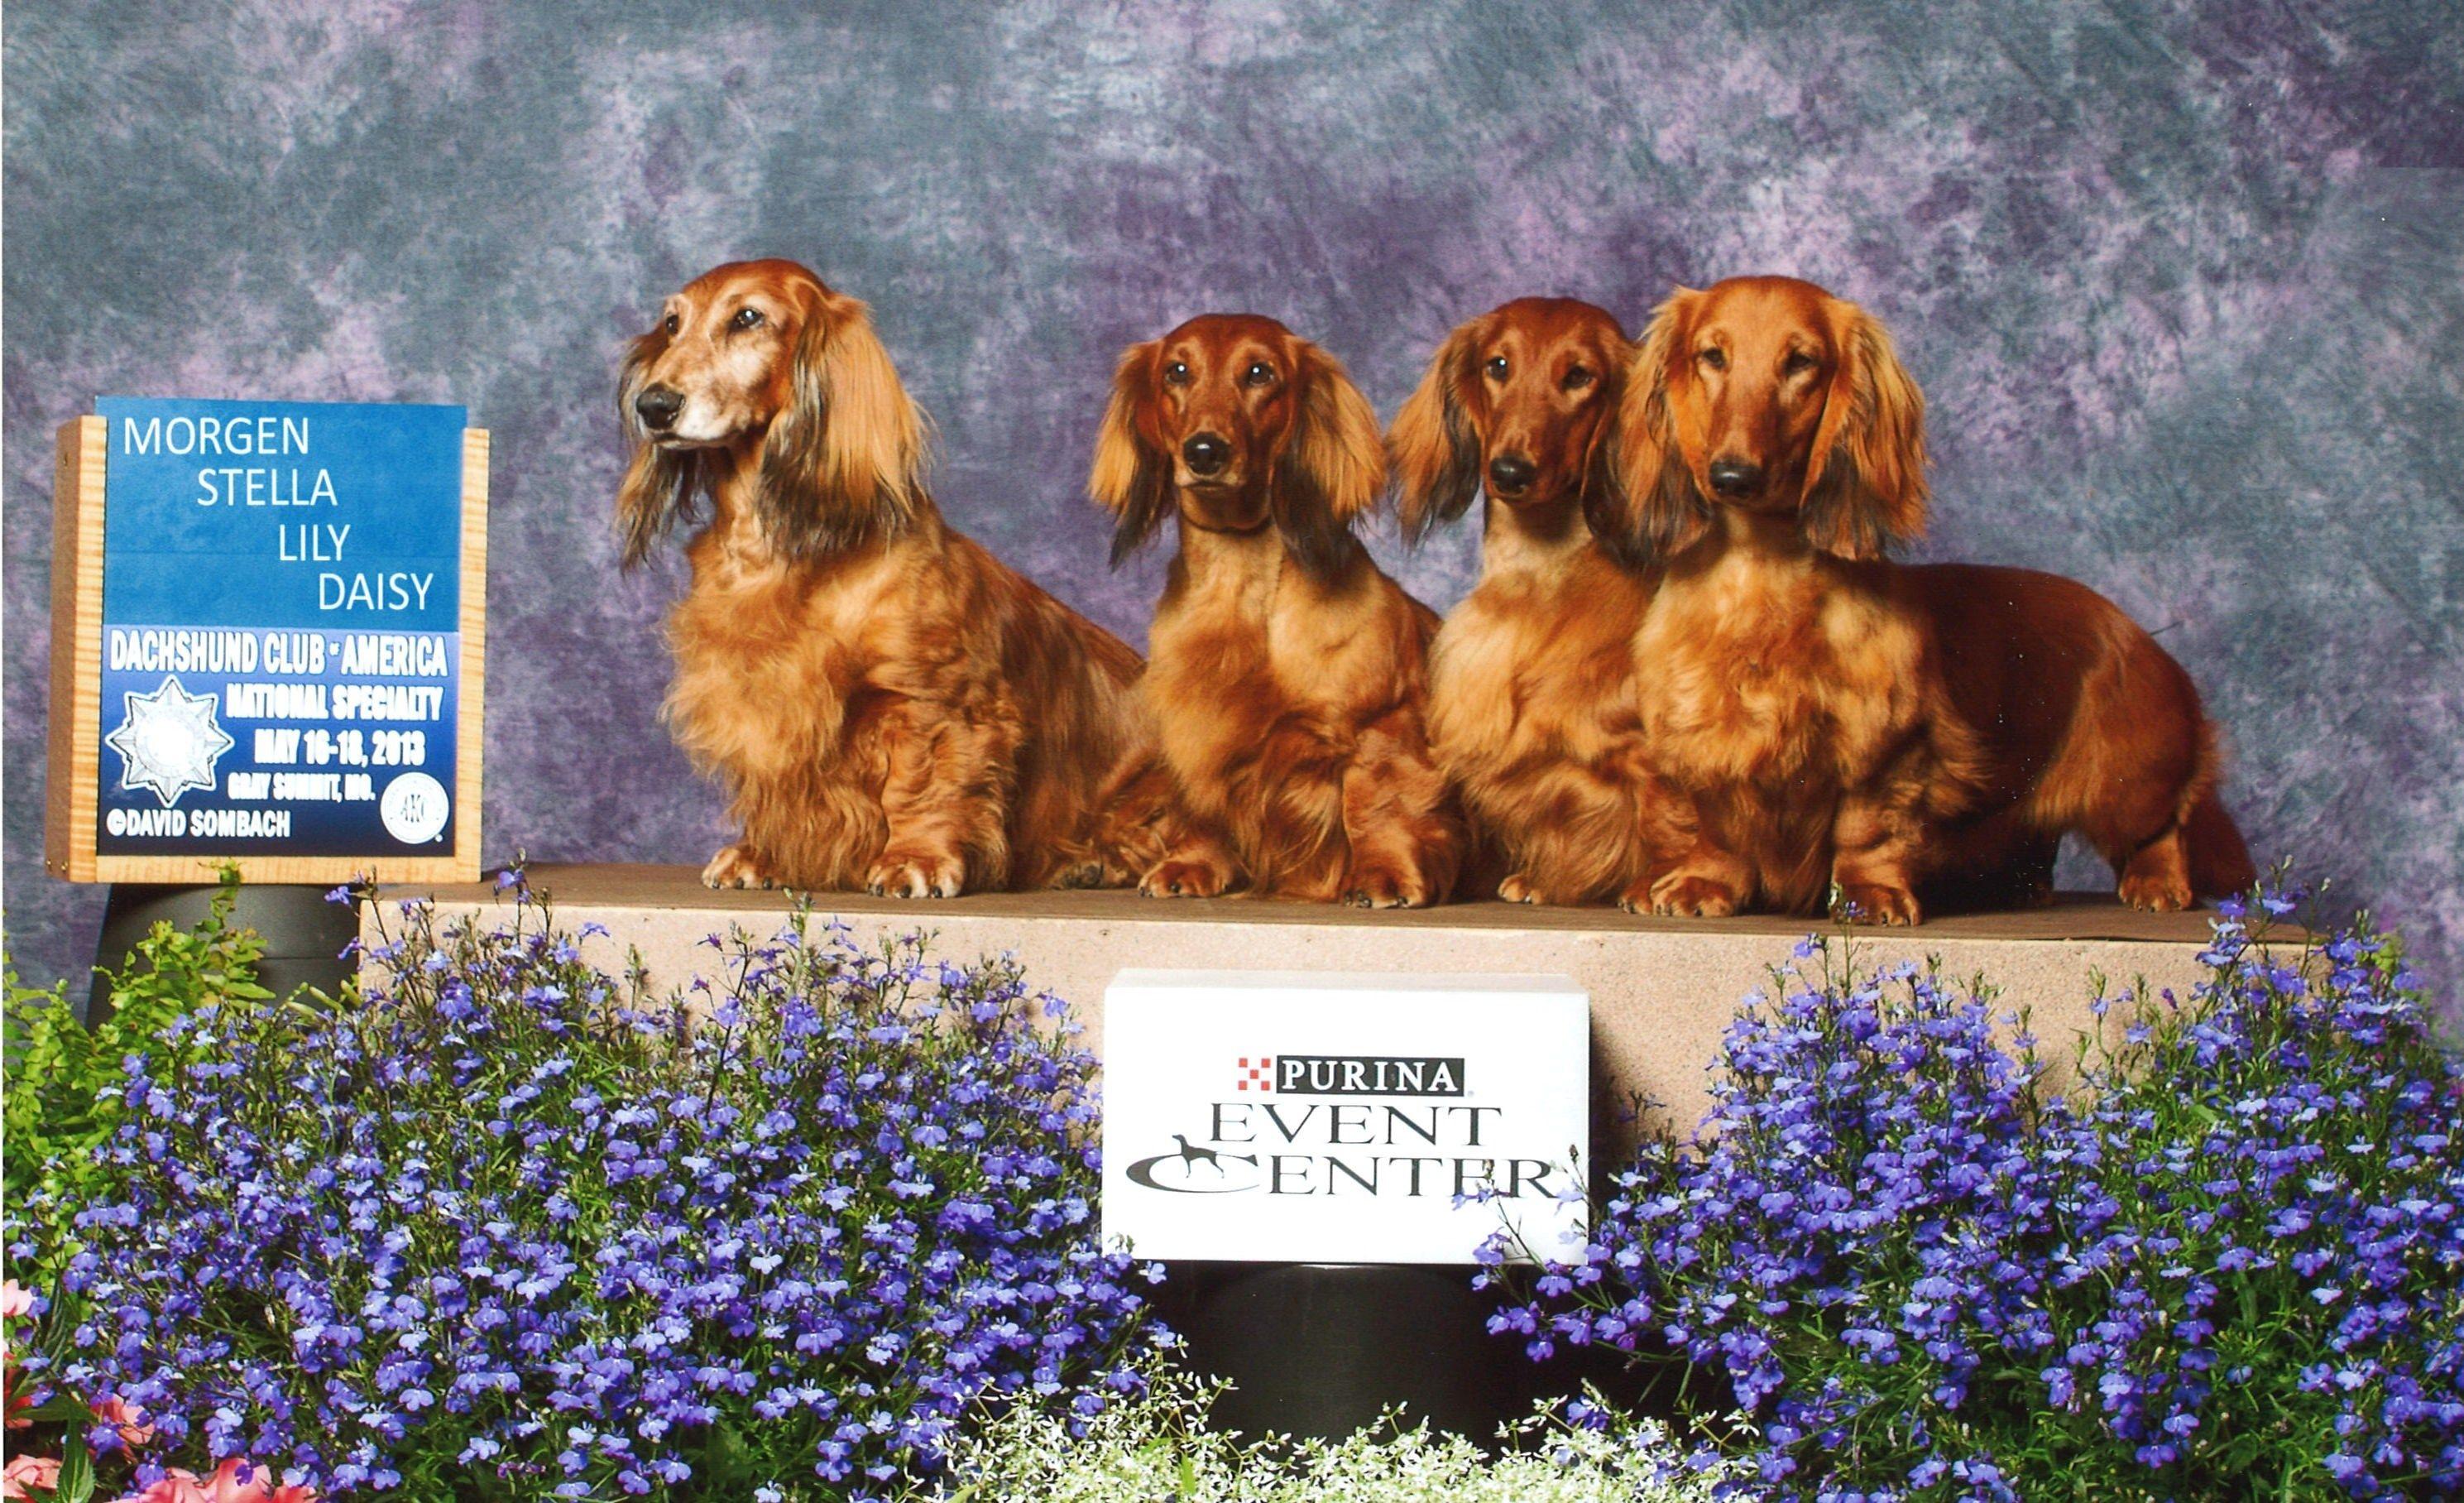 Stardust Dachshunds Wisconsin Dachshund Dachshund Breeders Dog